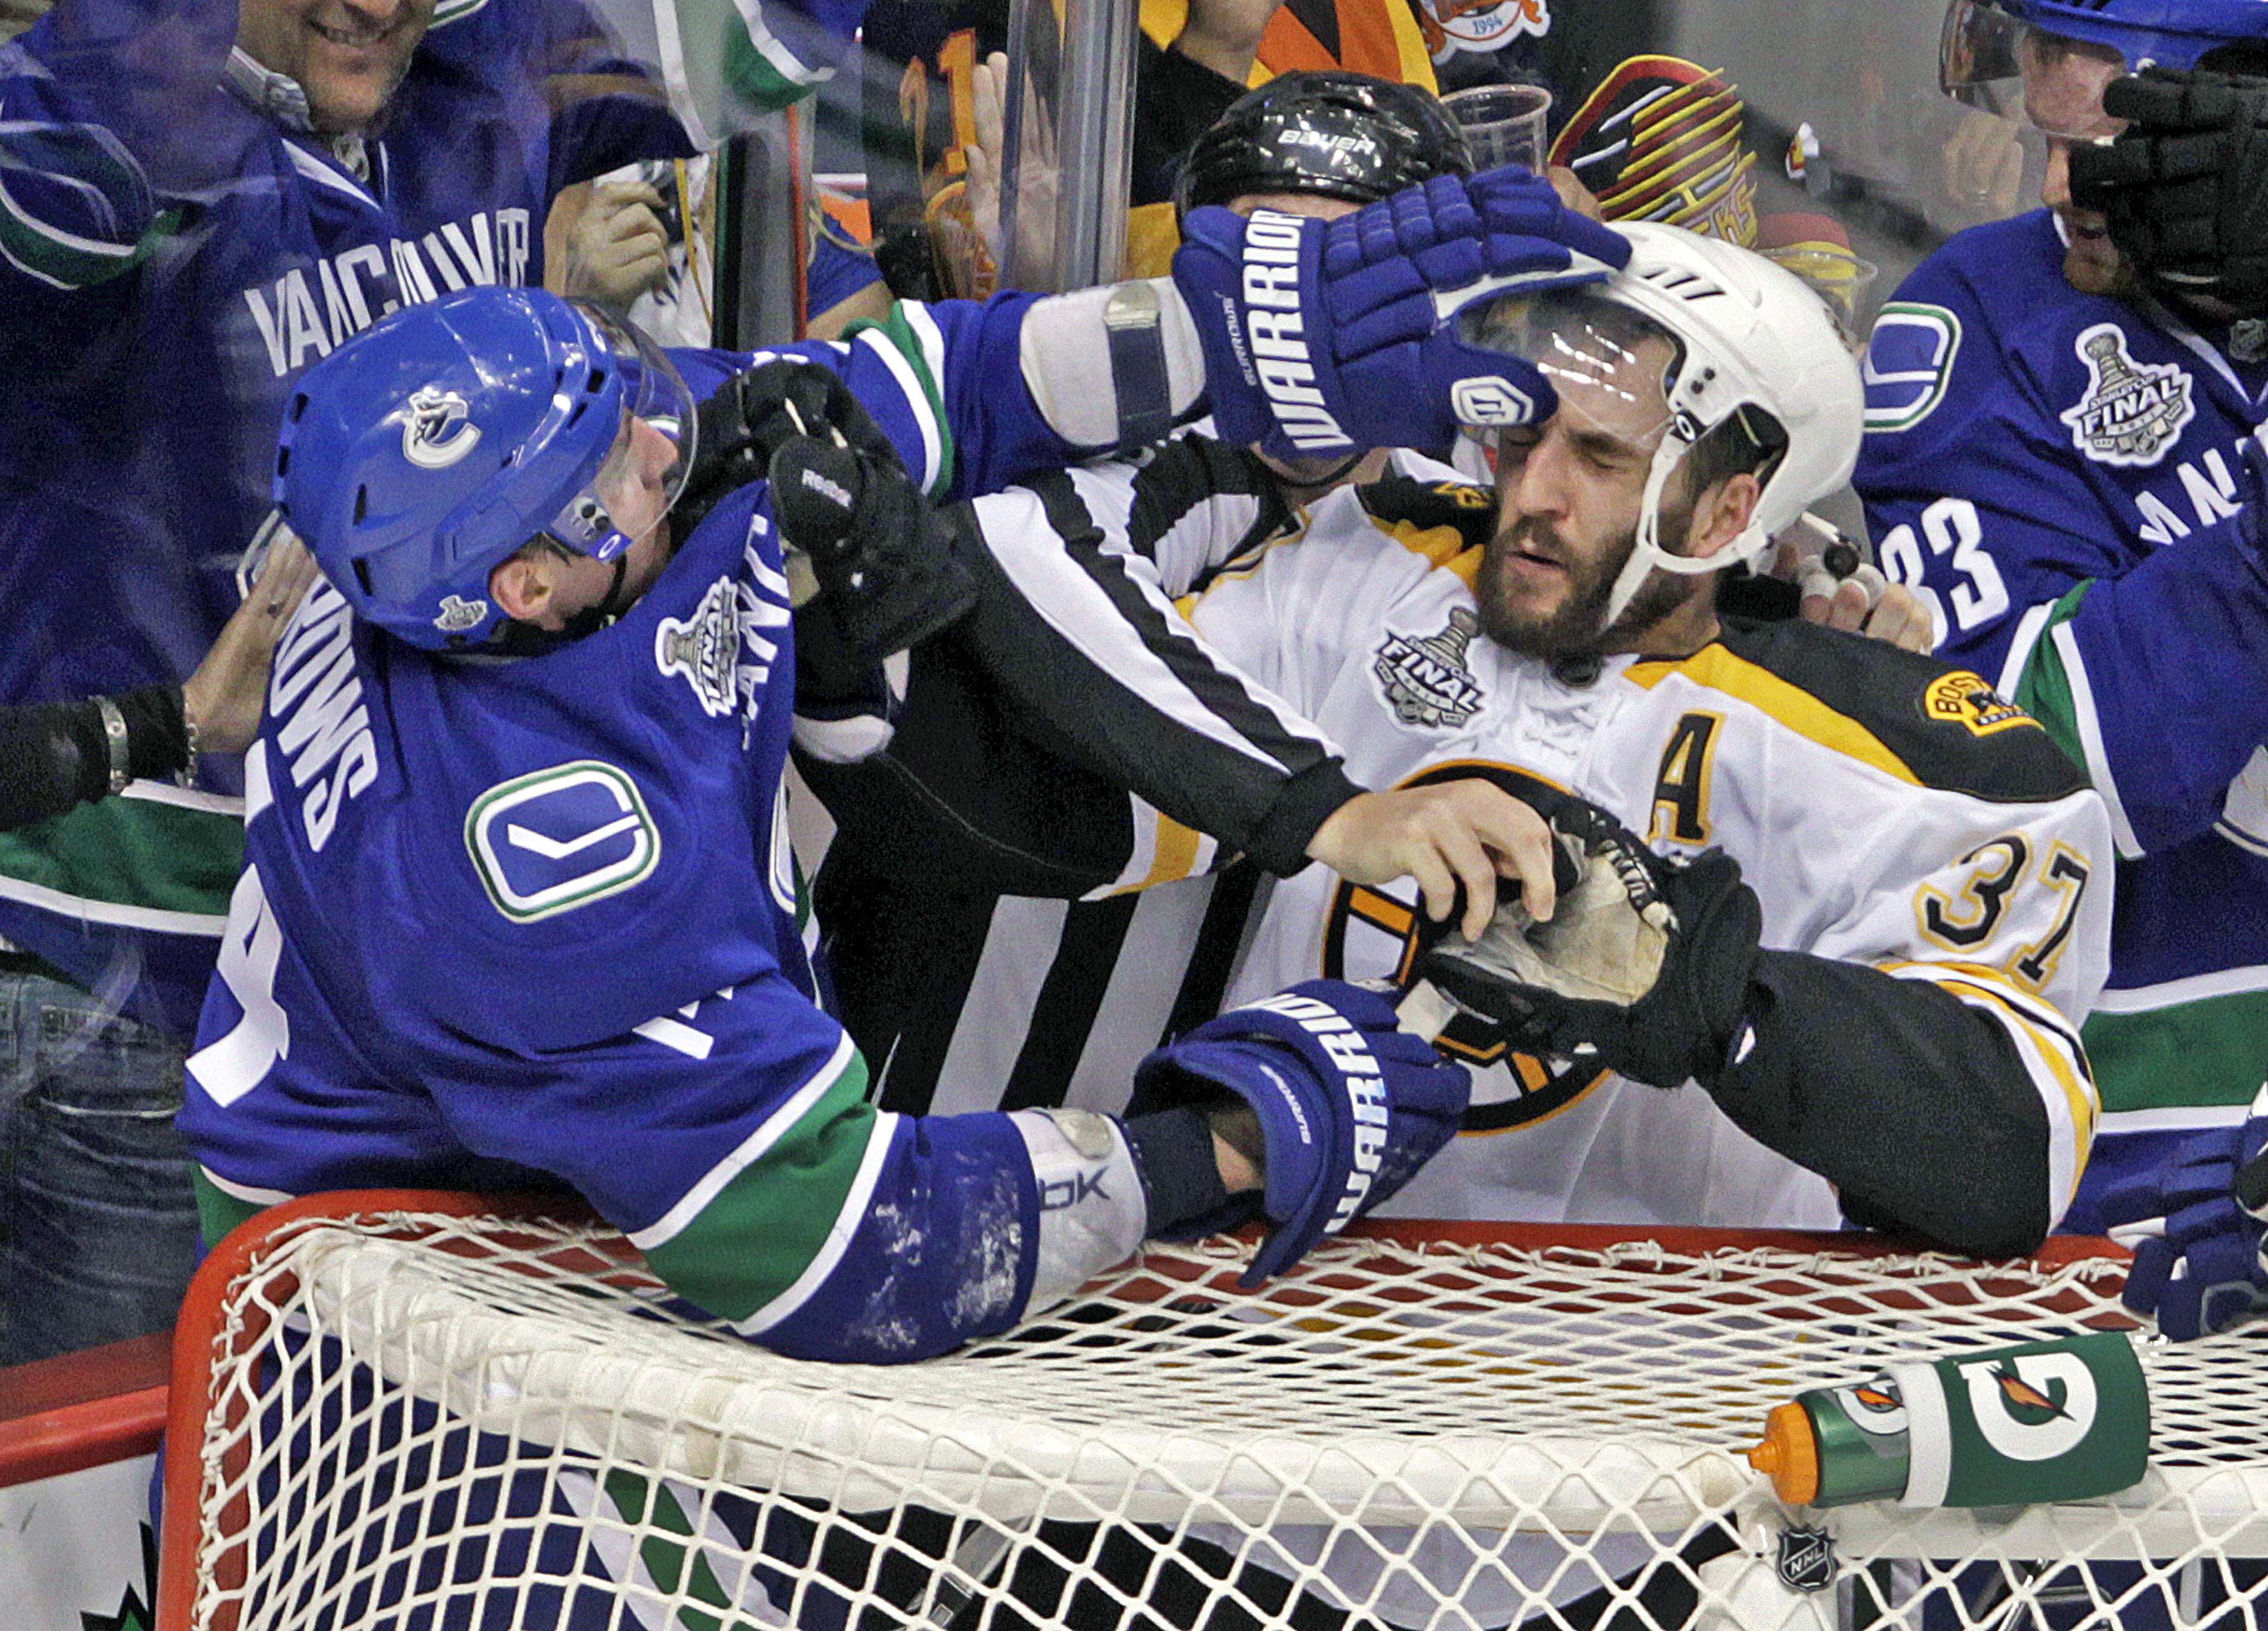 Boston Bruins Vs. Vancouver Canucks At Rogers Arena